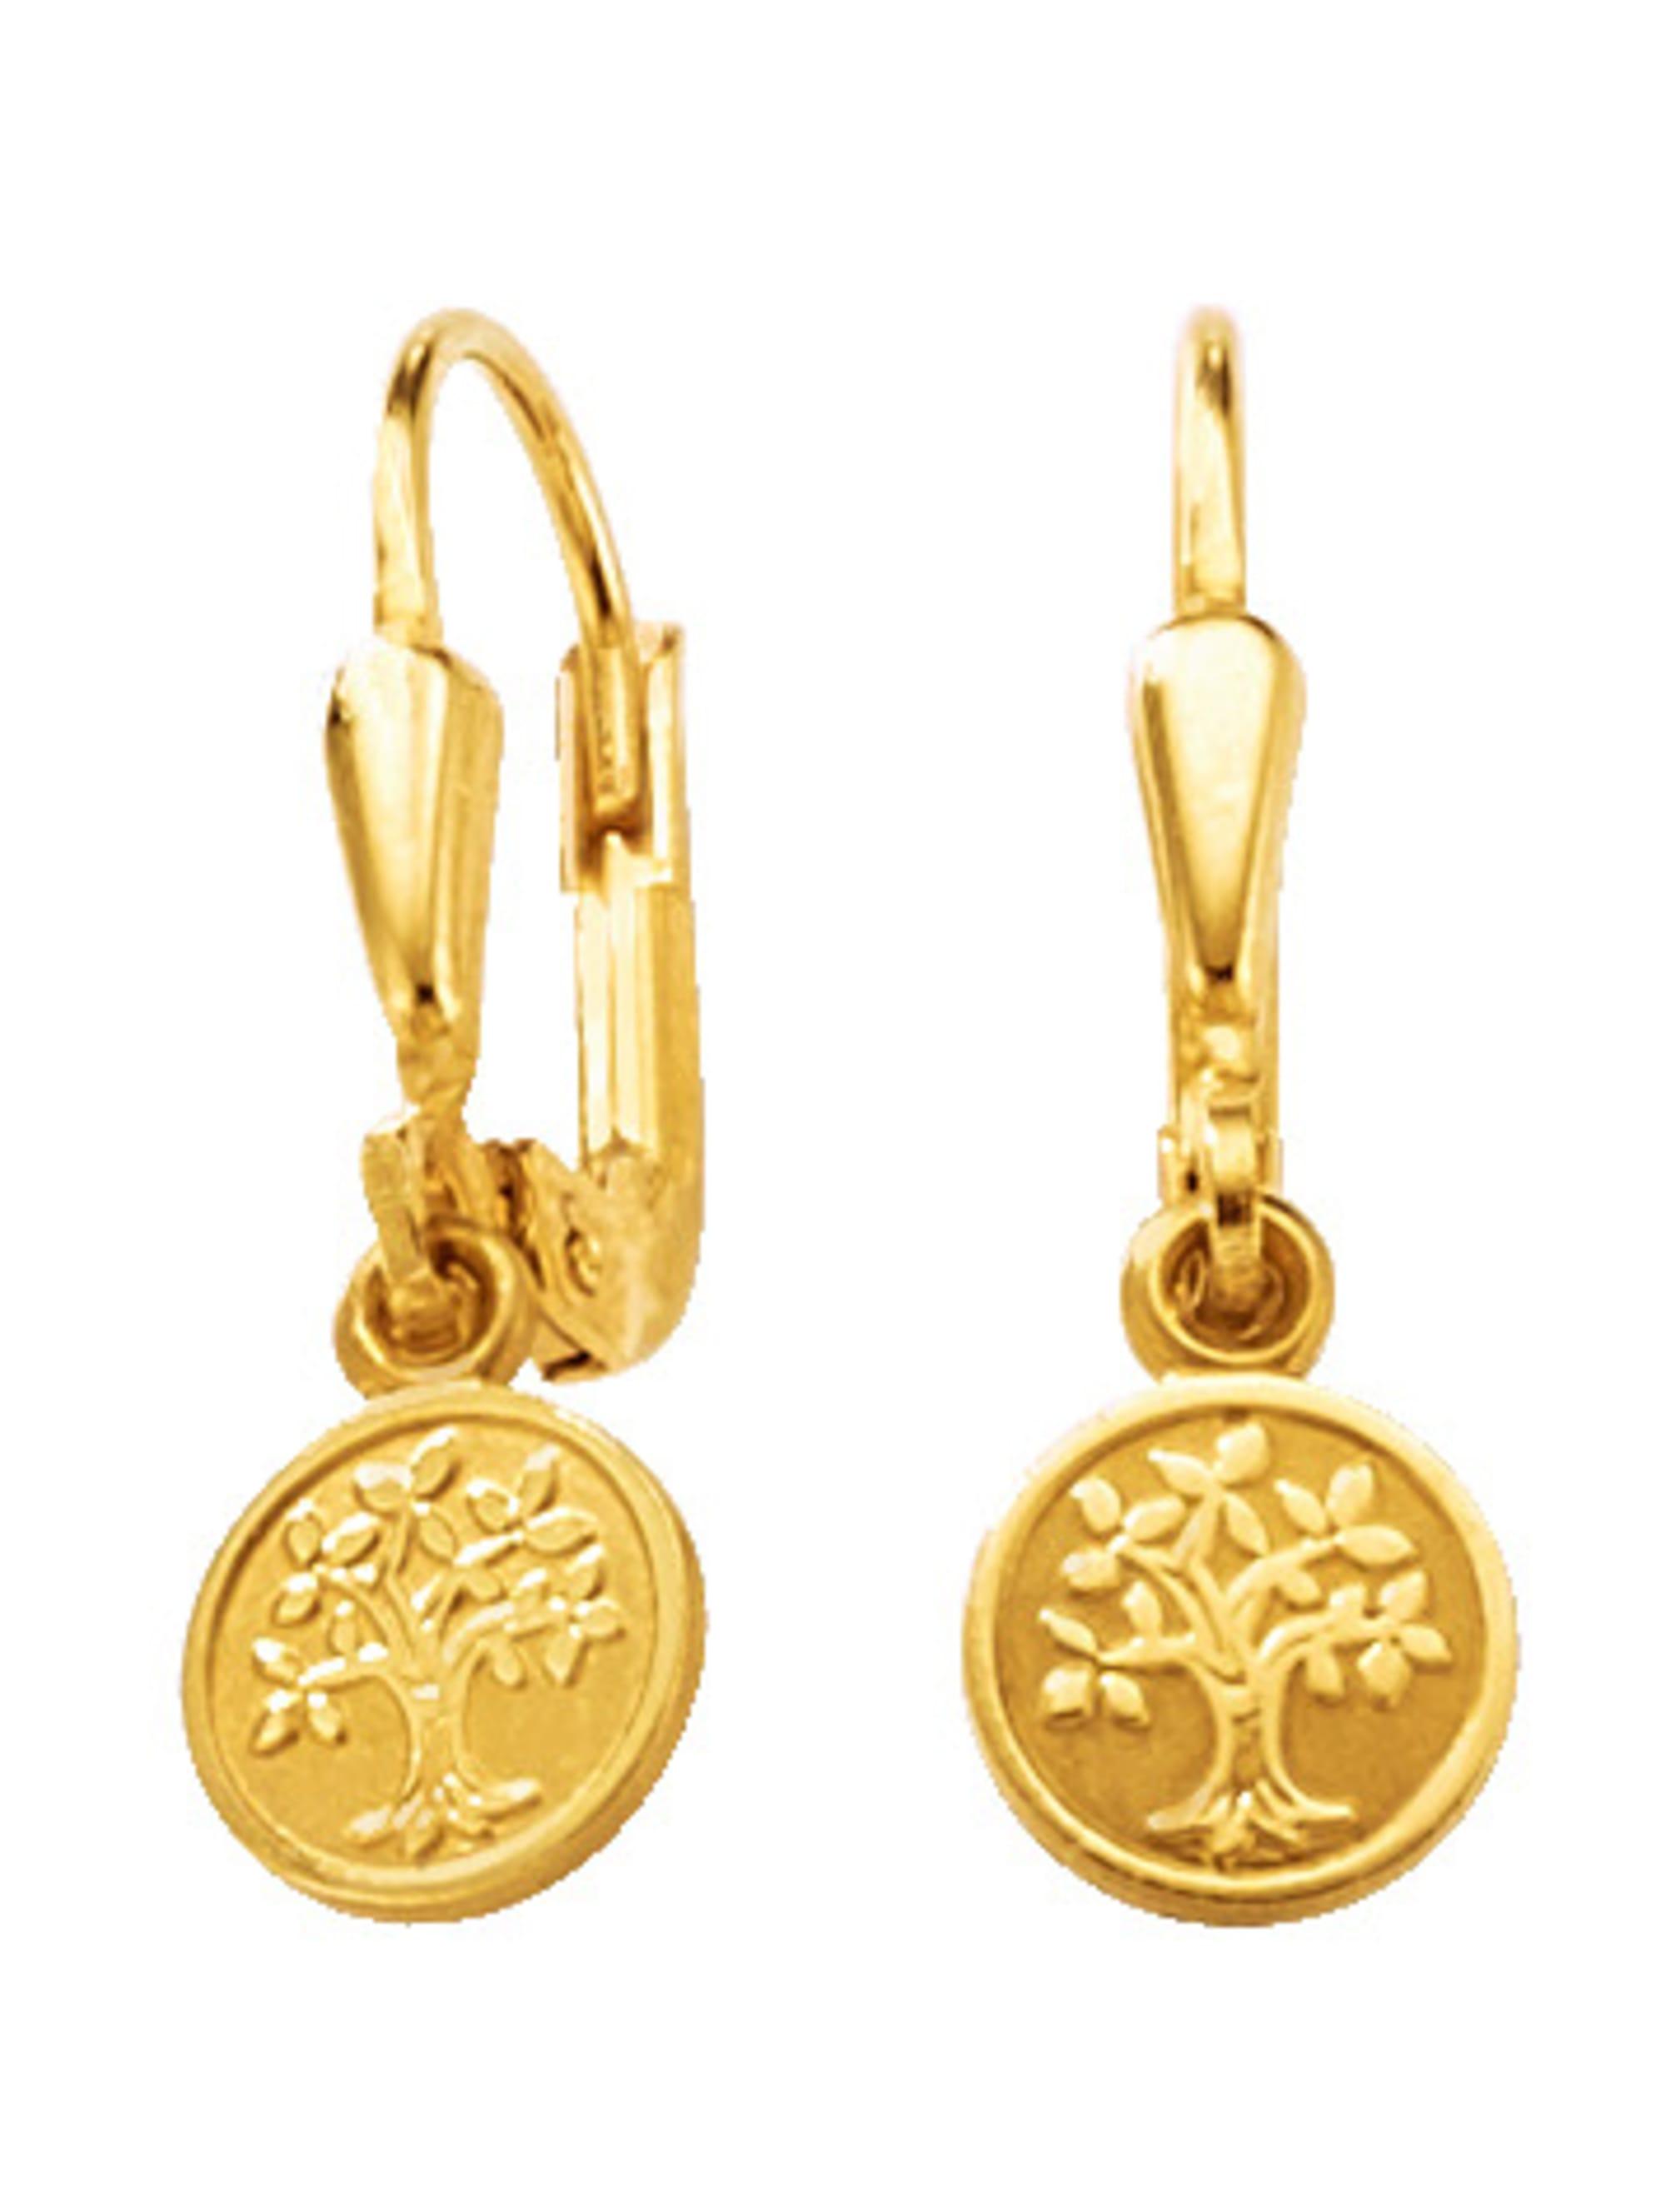 Lebensbaum-Ohrringe in Gelbgold 333 FulFt